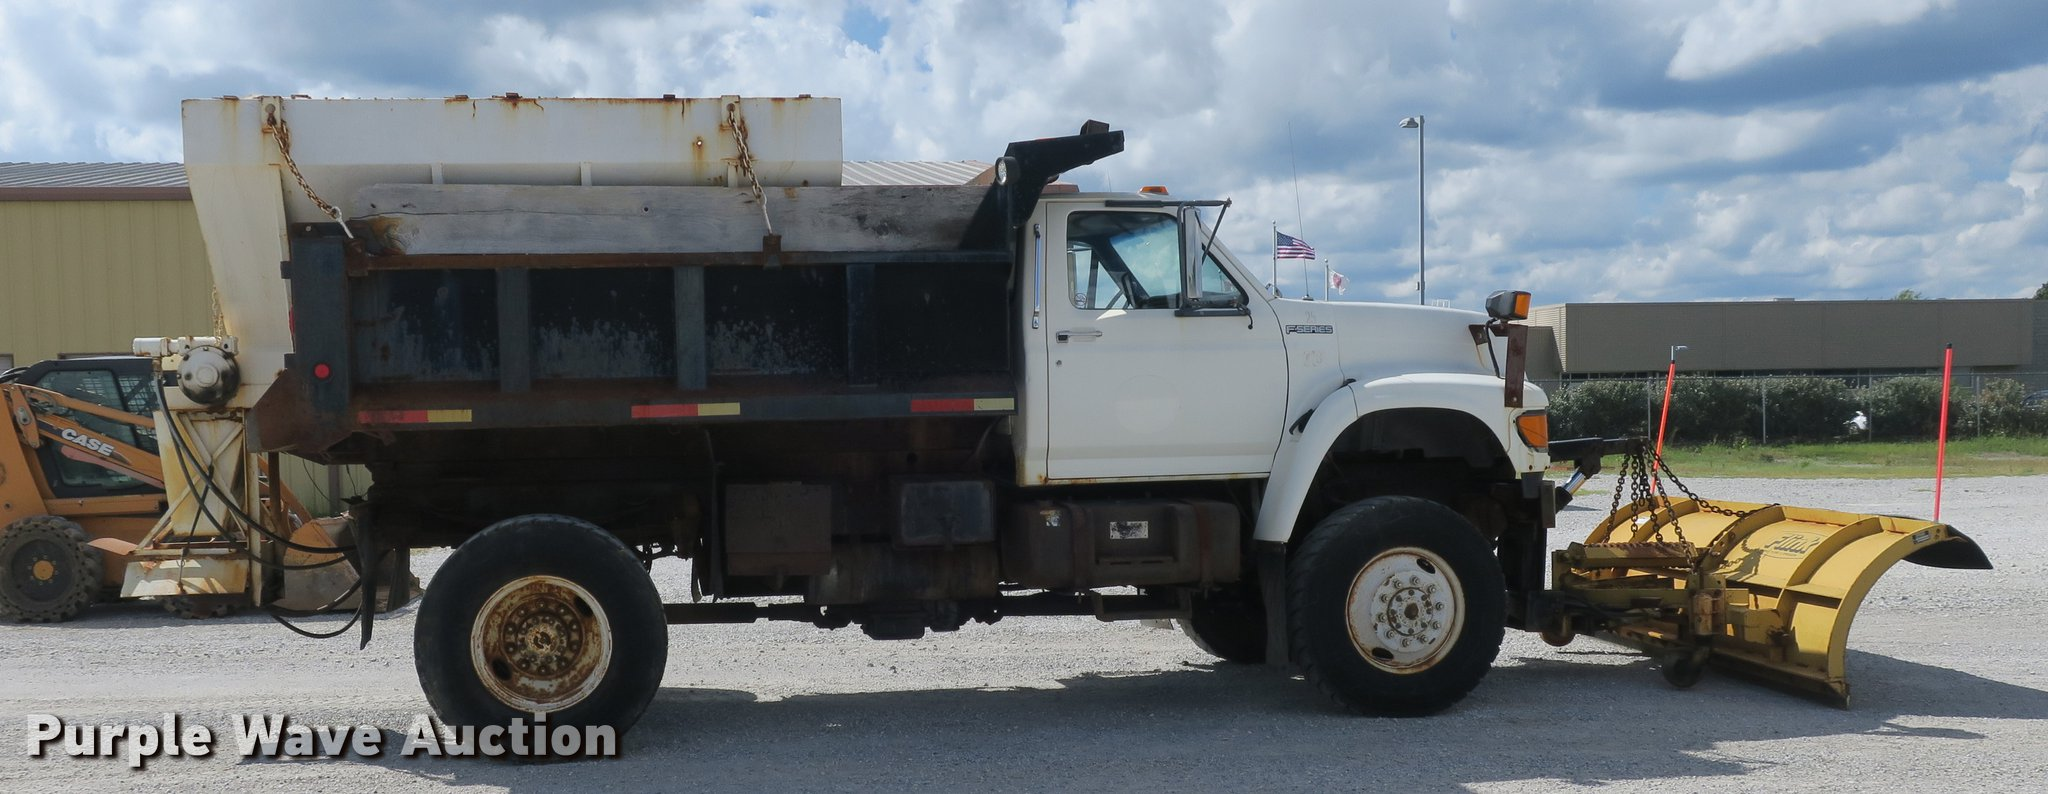 ... 1998 Ford F800 dump truck Full size in new window ...